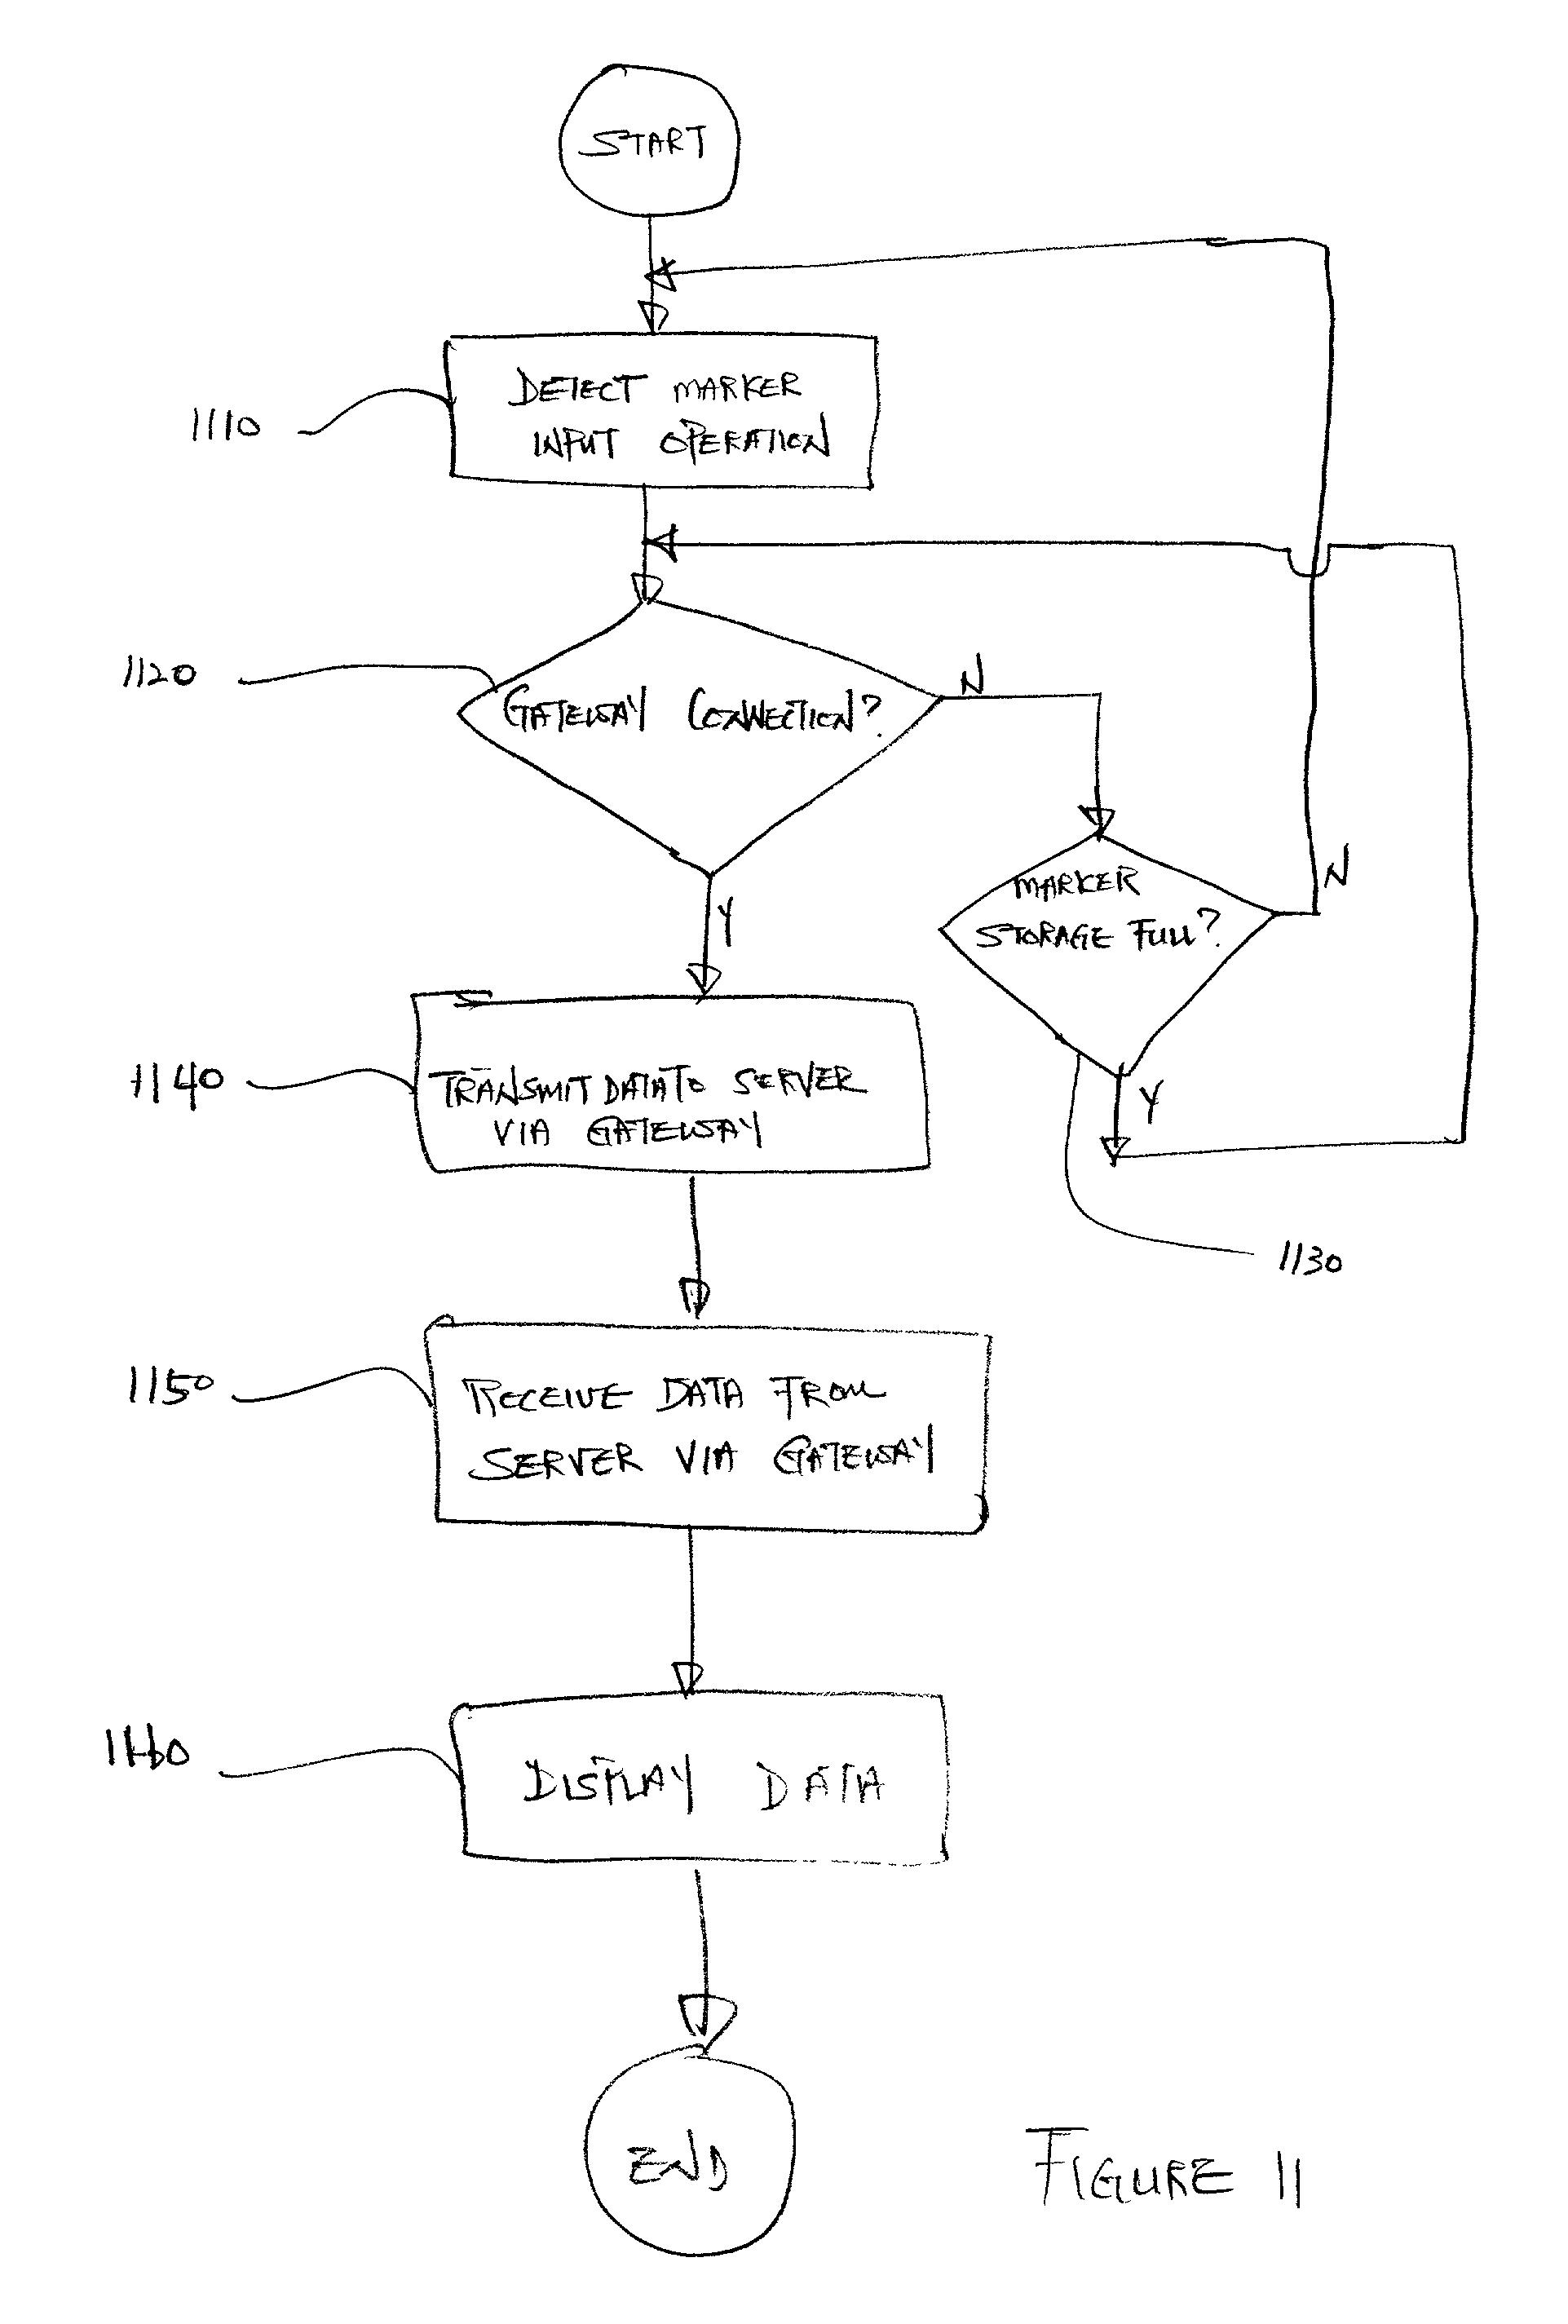 gps-1830e电路图